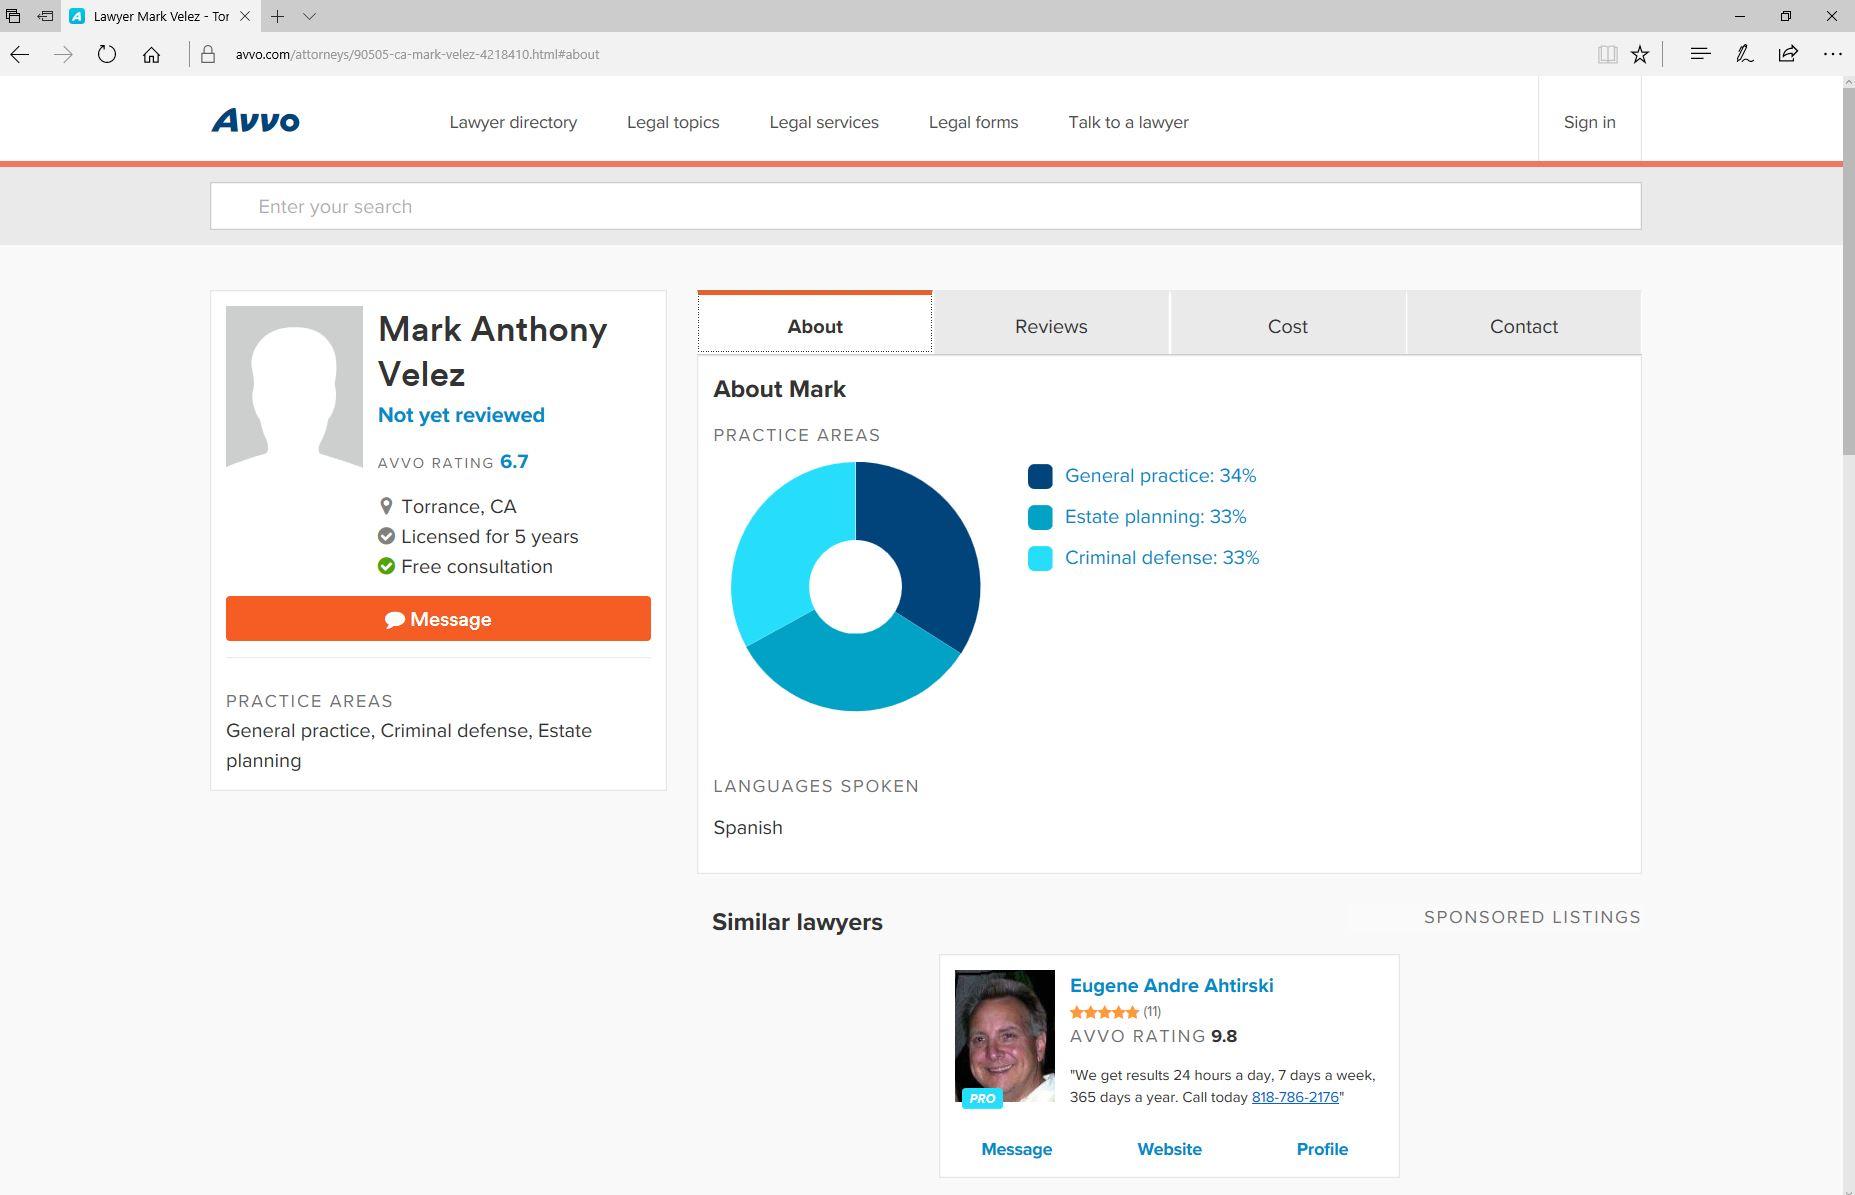 Velez Mark Avvo Profile Criminal Defense